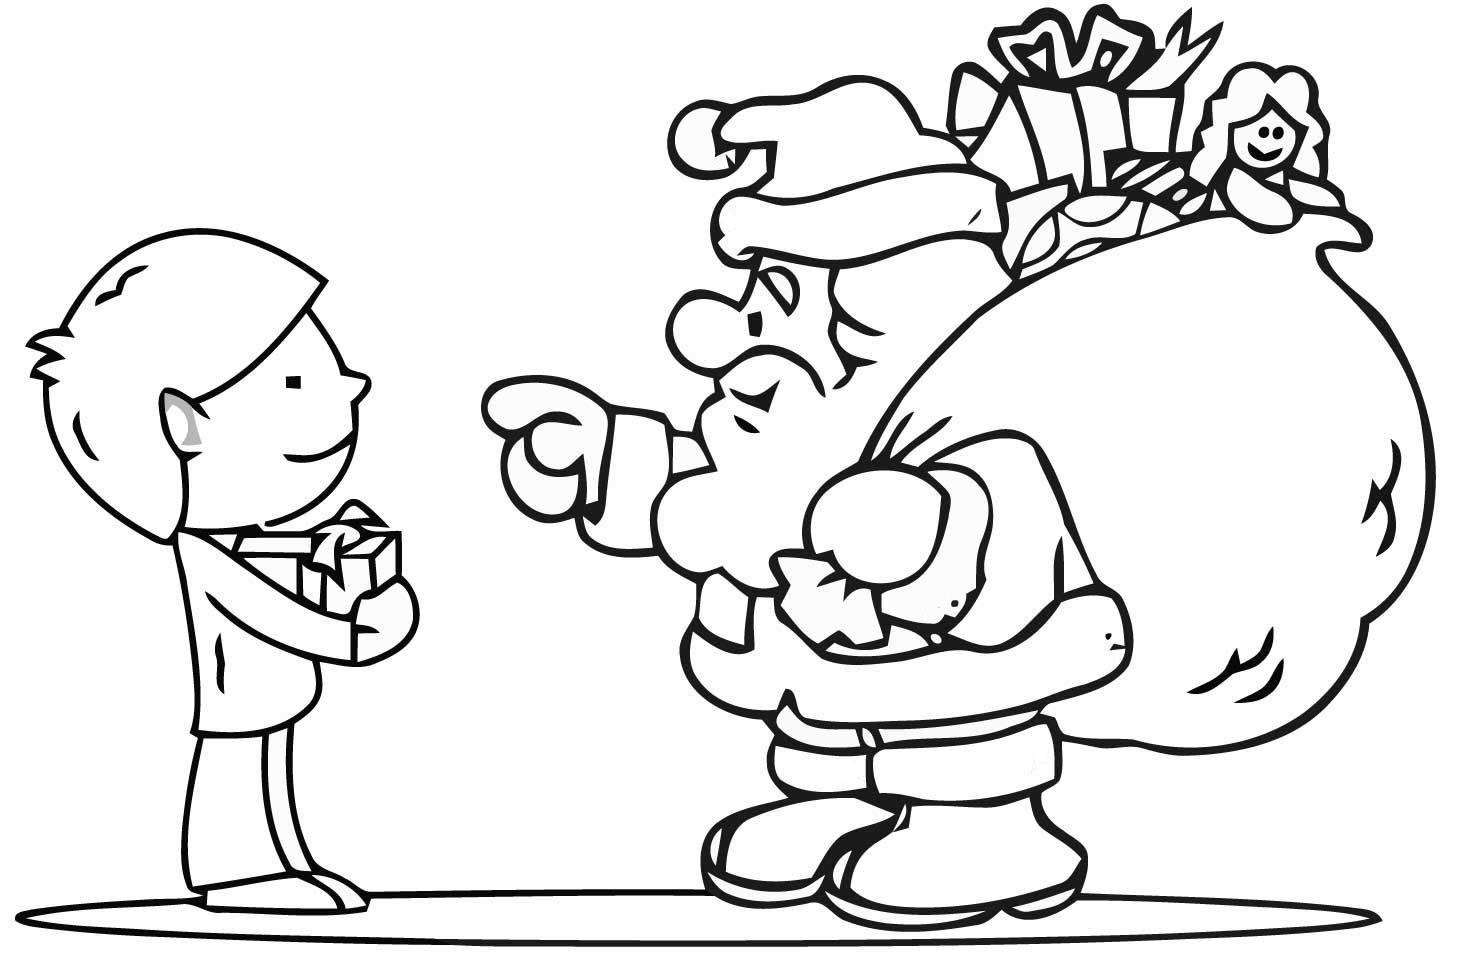 Niño Dibujo Para Colorear: Dibujos De Navidad Para Colorear, Imágenes Navidad Para